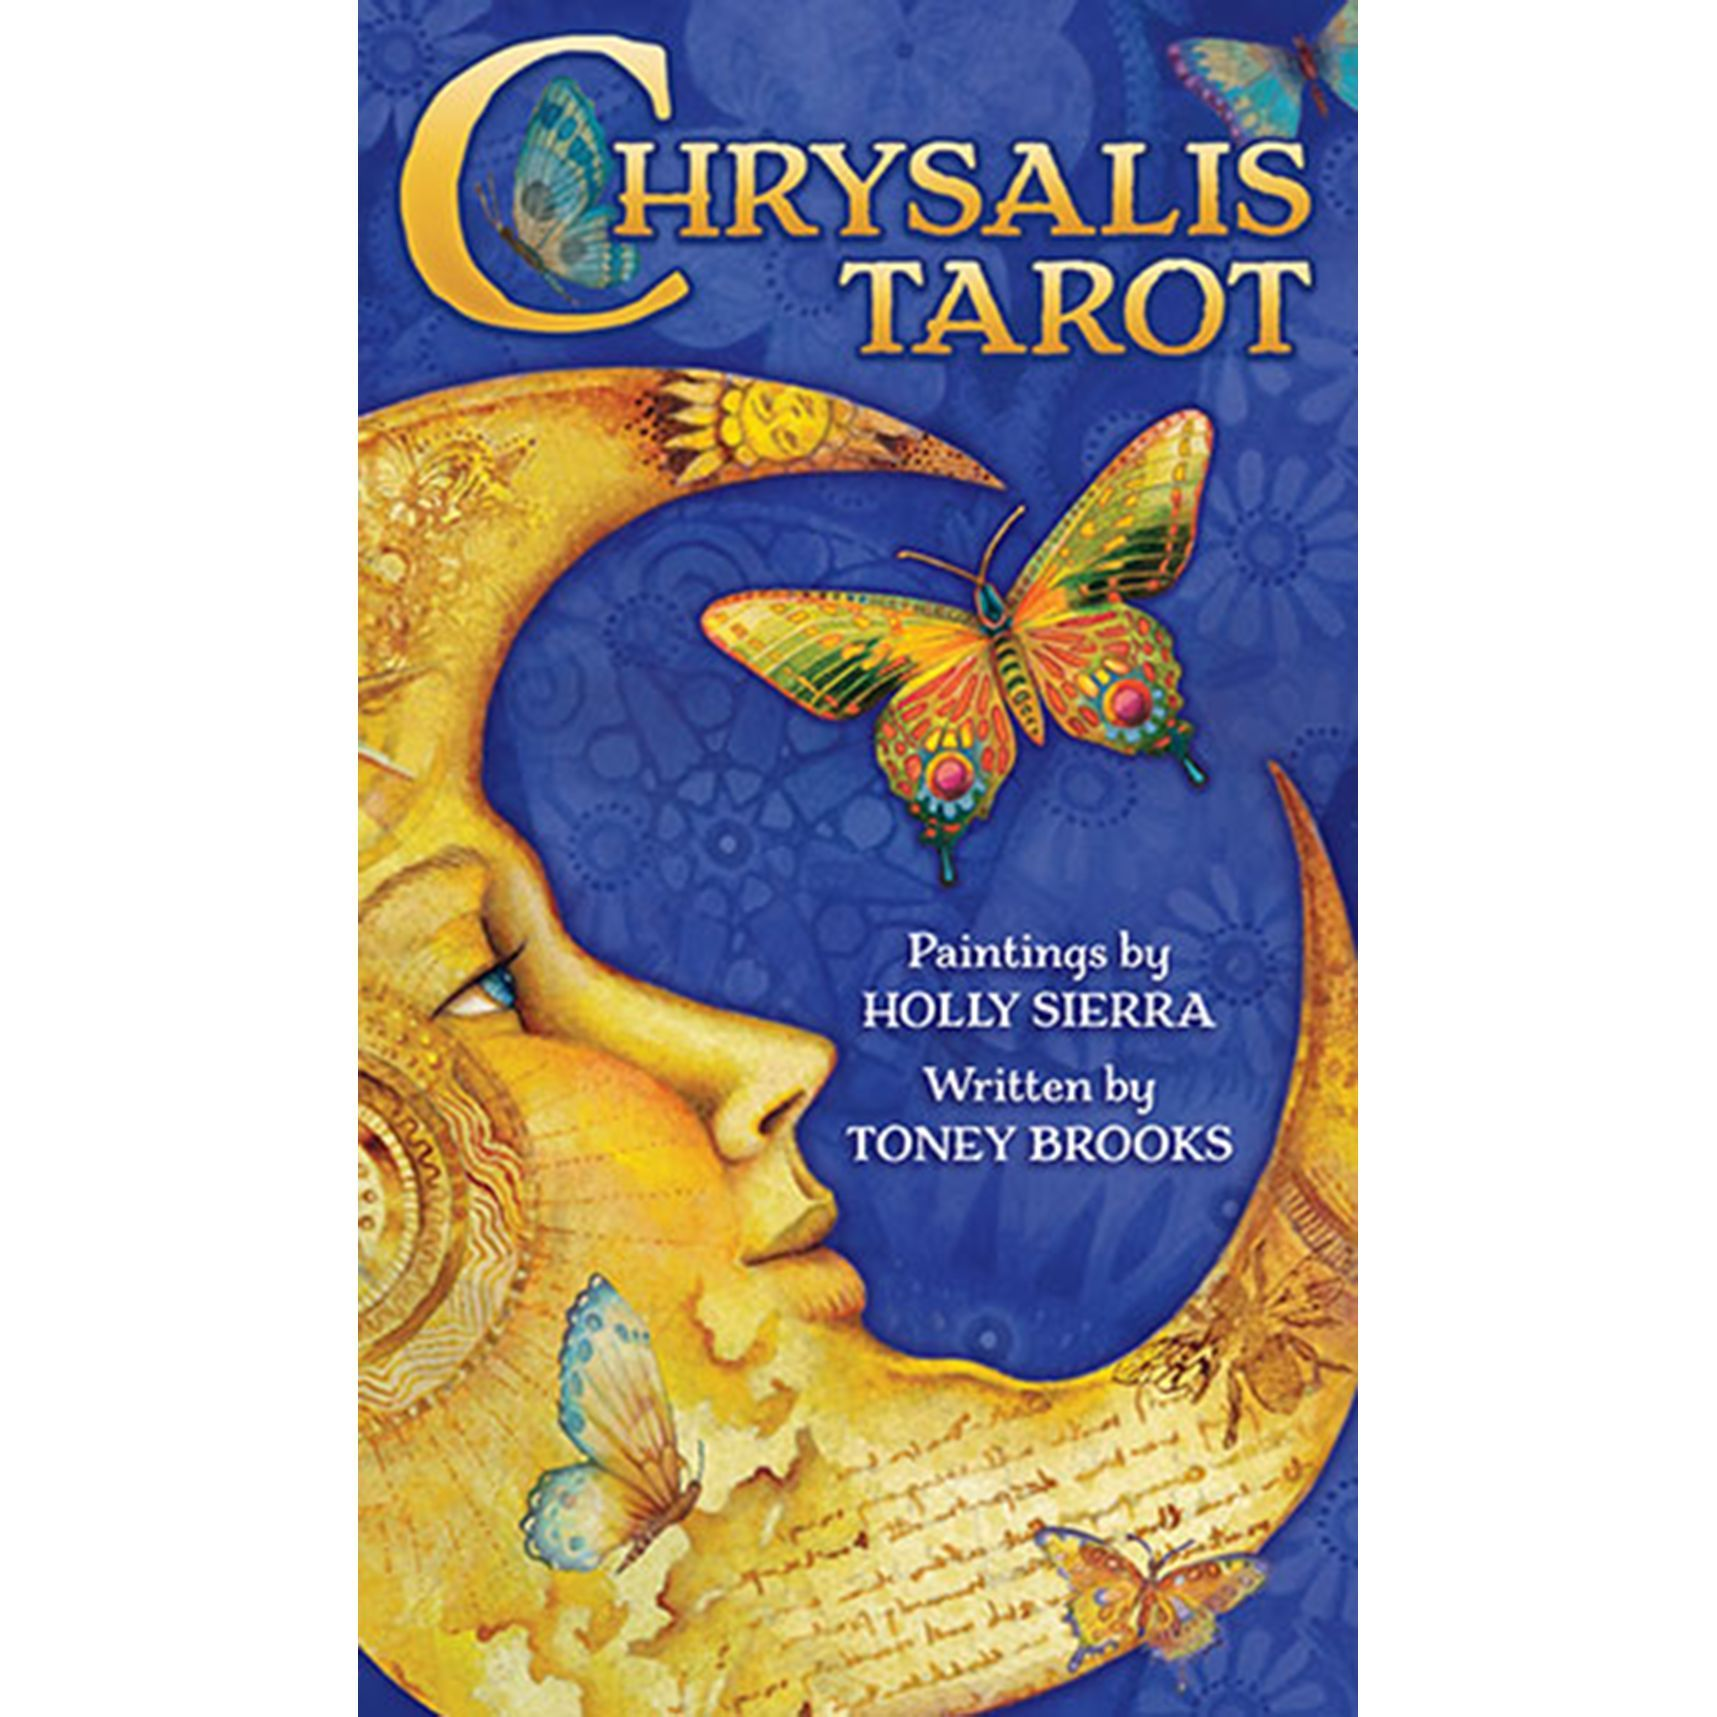 Chrysalis tarot tarot decks tarot best tarot decks